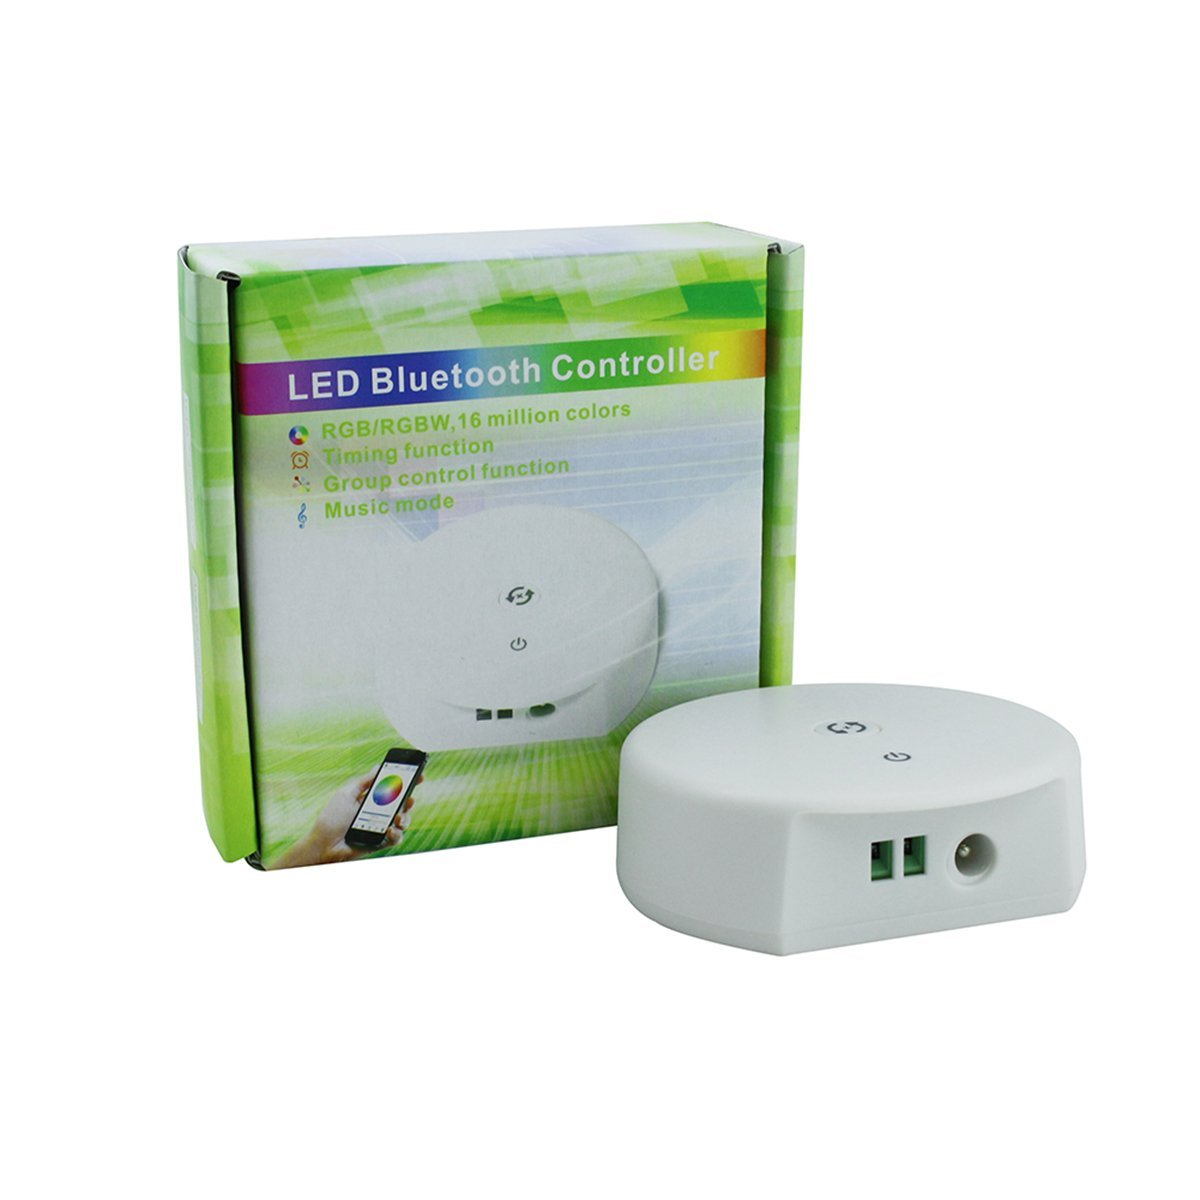 KPBOTL Magic UFO LED Controller Bluetooth RGB control dimmer DC12-24V for RGB,RGBW,RGBWW led strip light Smartphone Control support IOS or Android system (Bluetooth)